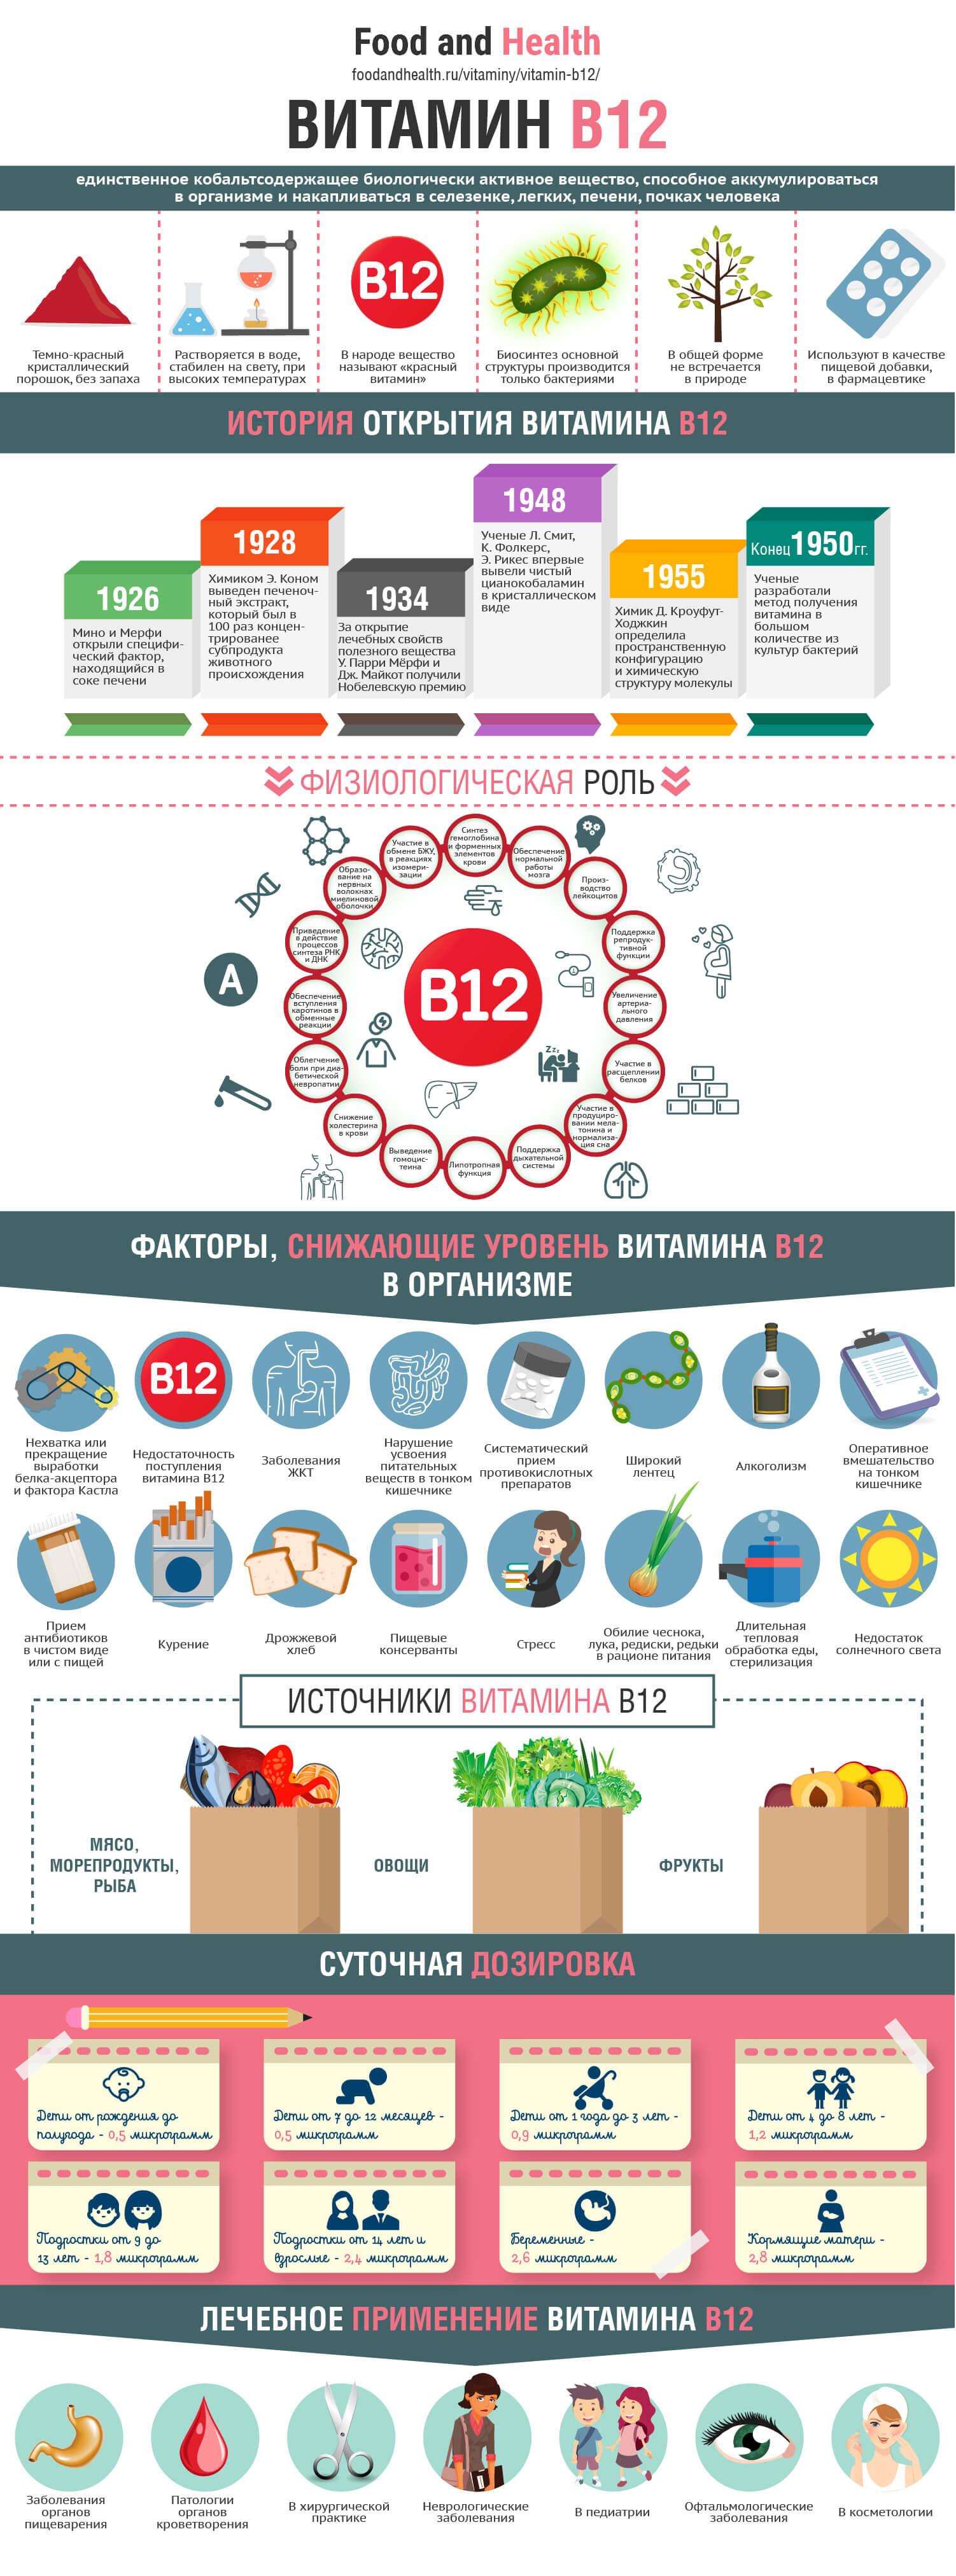 Витамин B12: инфографика